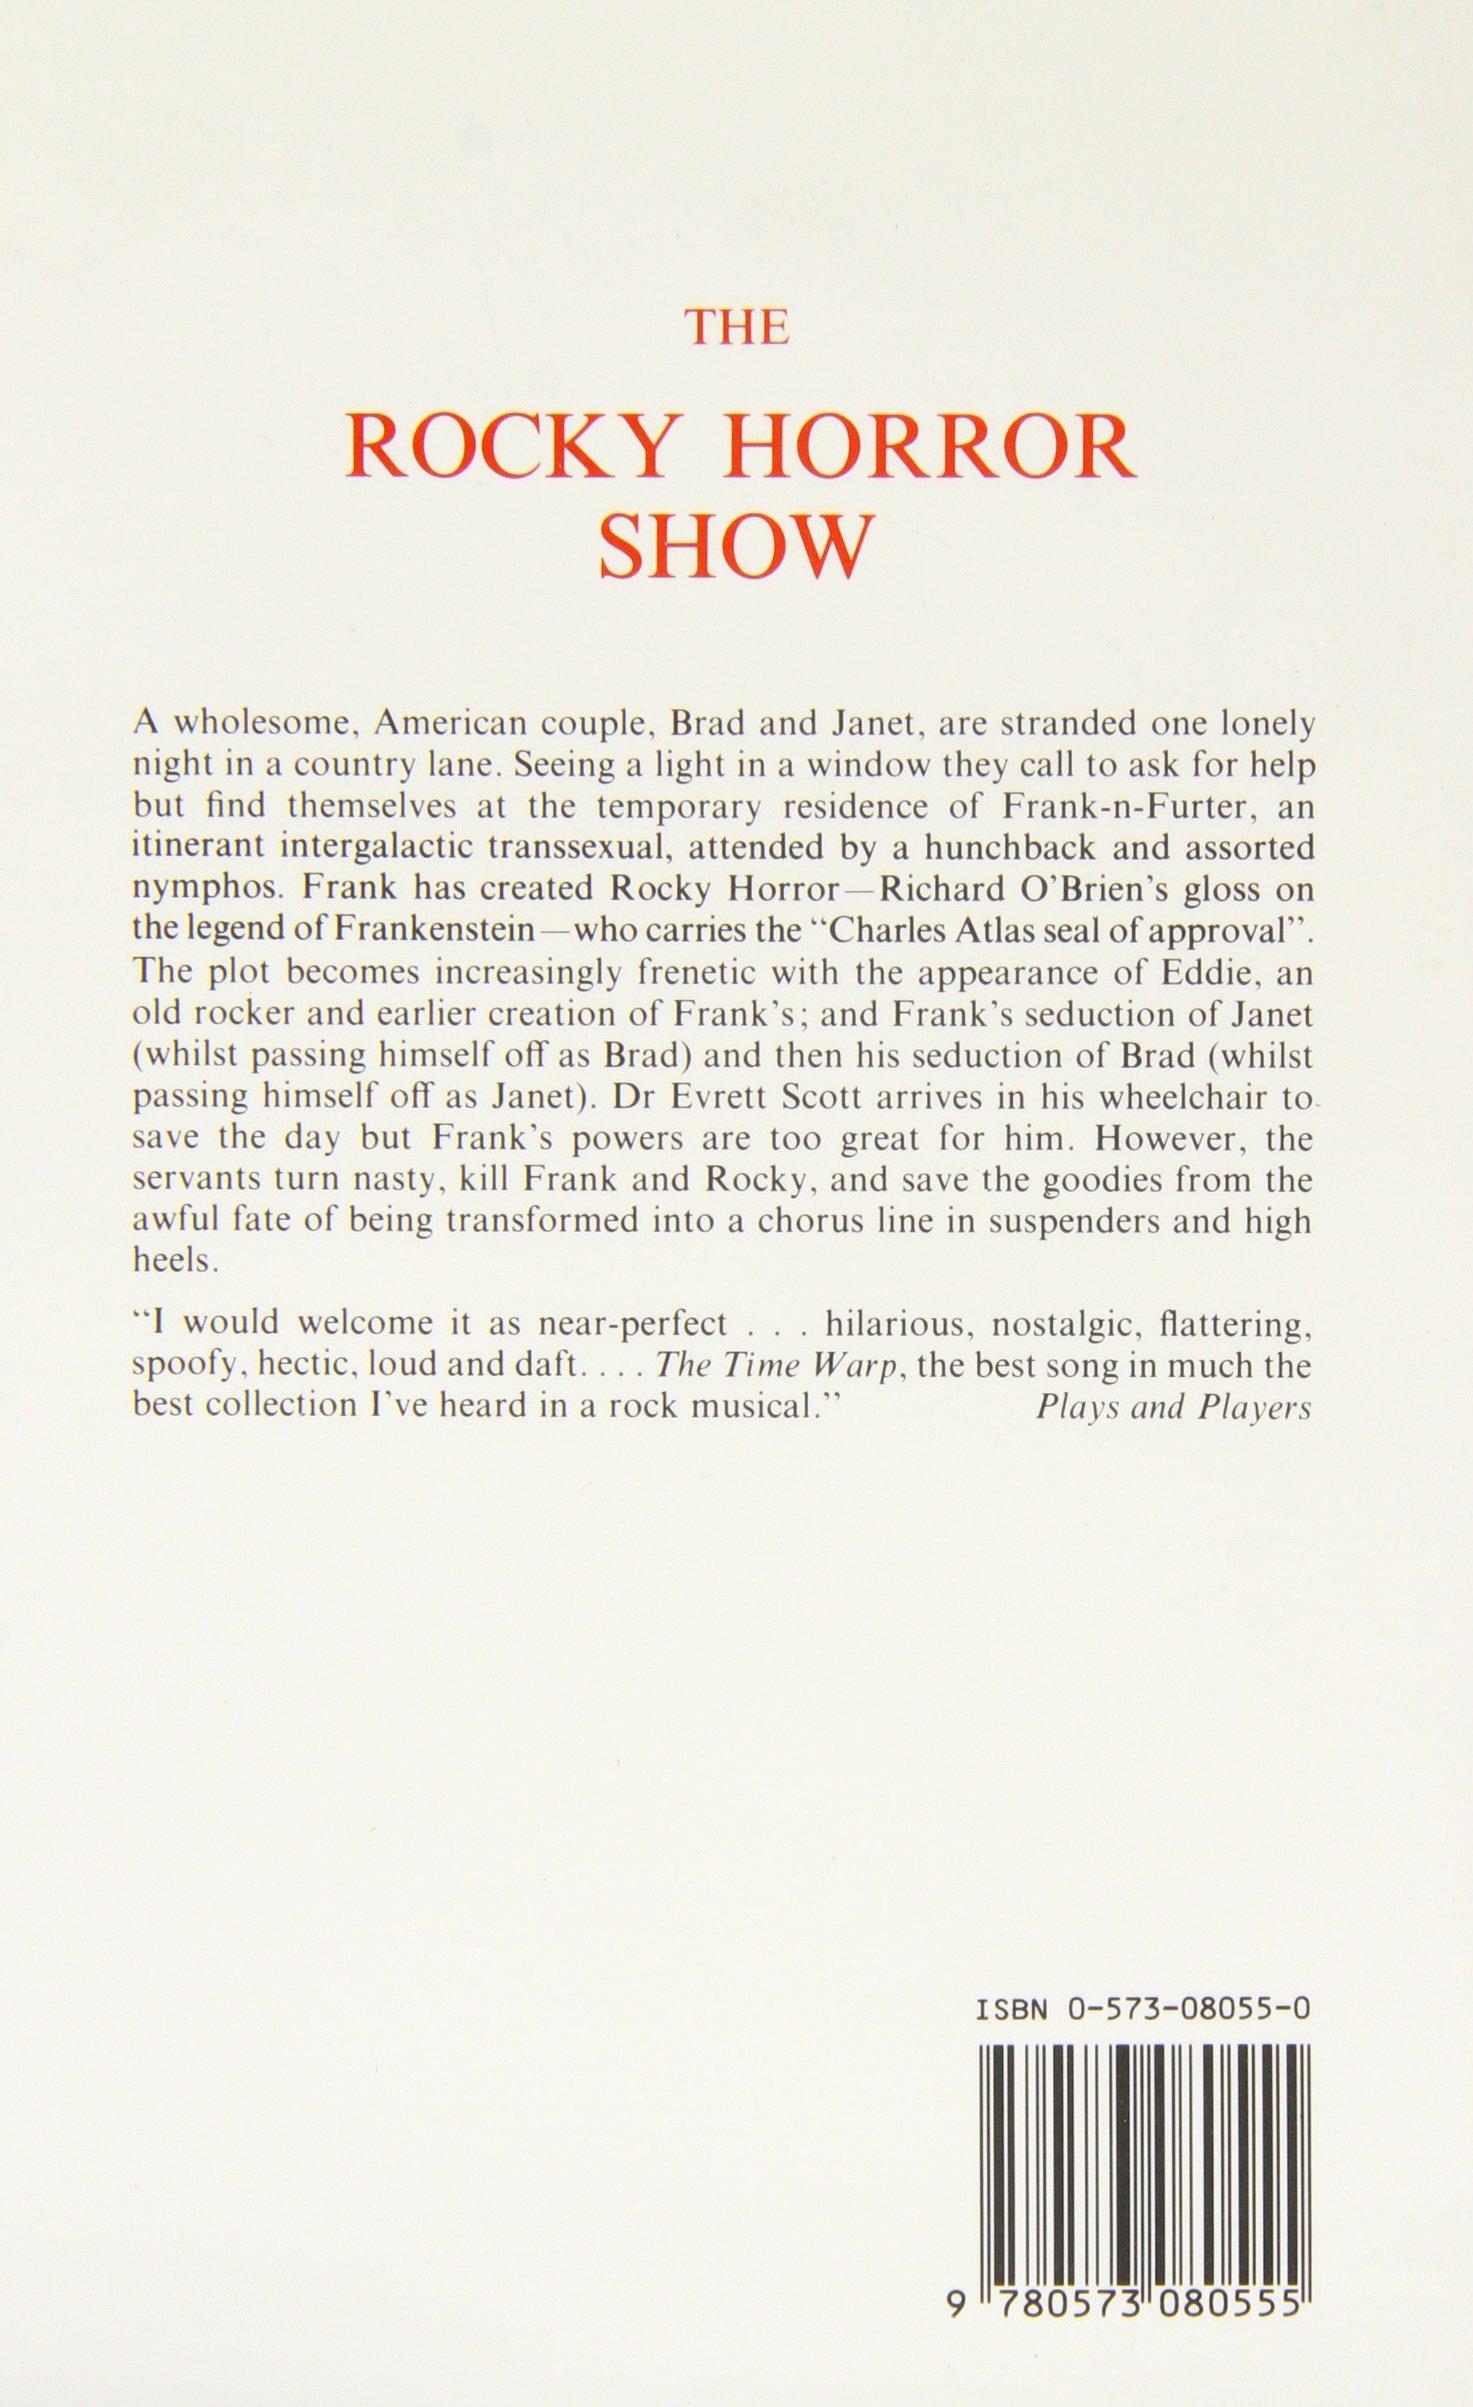 The Rocky Horror Show: Libretto (Acting Edition): Amazon.co.uk: Richard  O'Brien: 9780573080555: Books